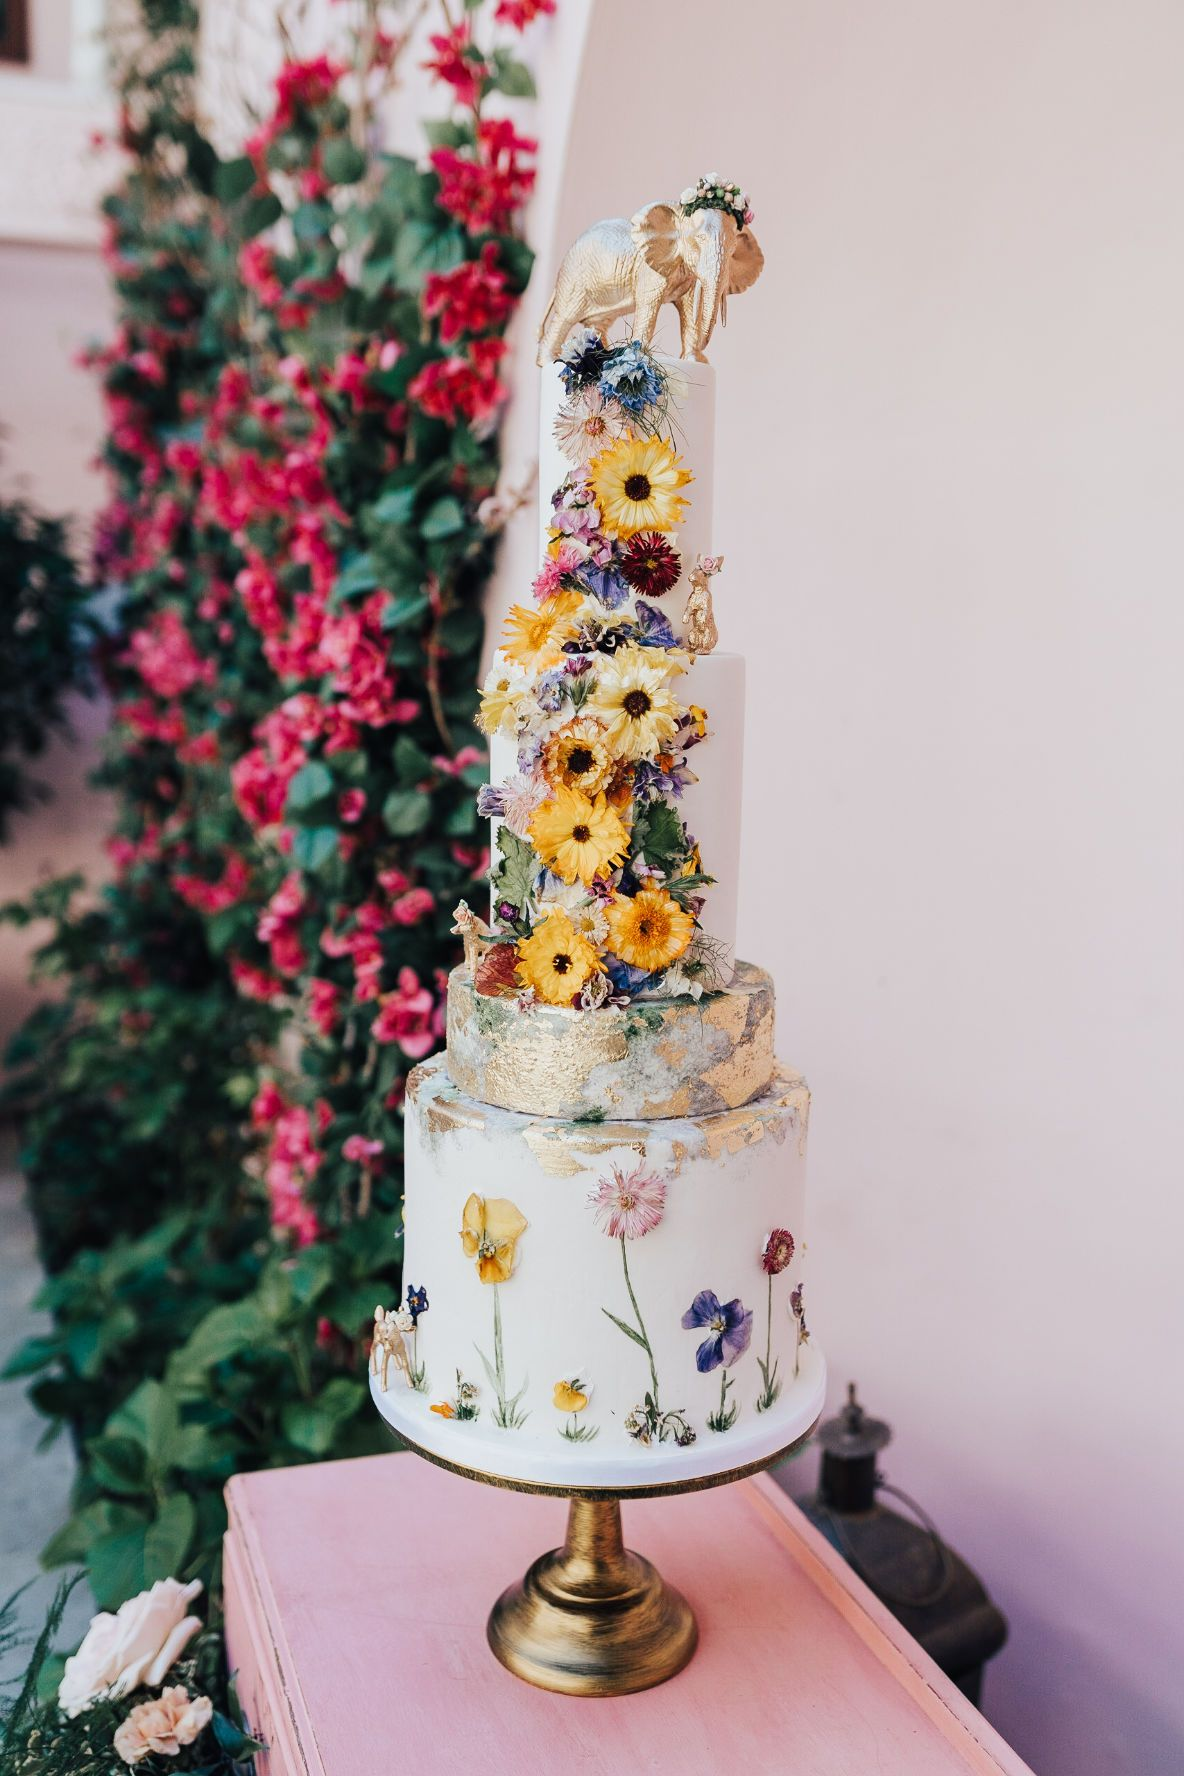 chelsea buns cake design rebecca carpenter photography wild at heart 1184